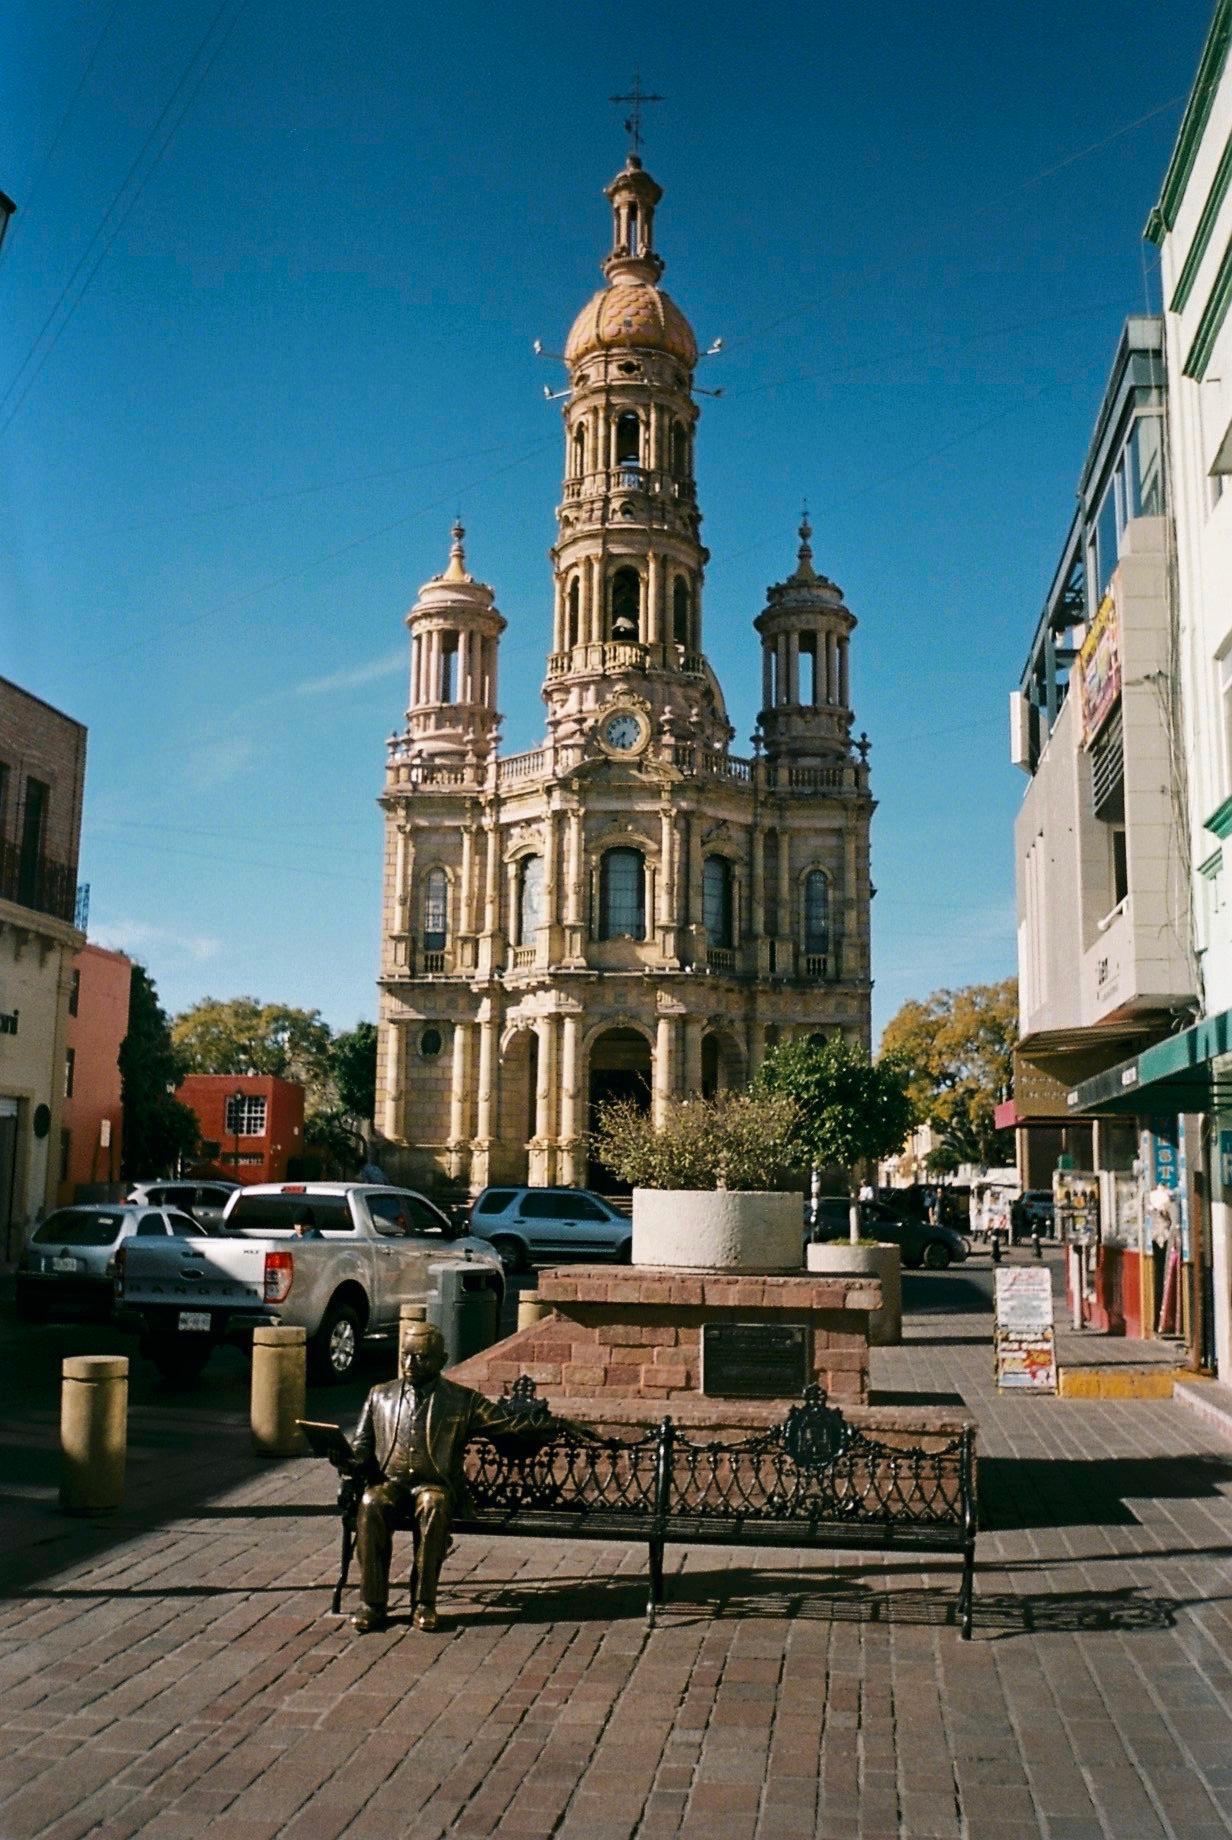 Aguascalientes 01-2020 - 15 of 24